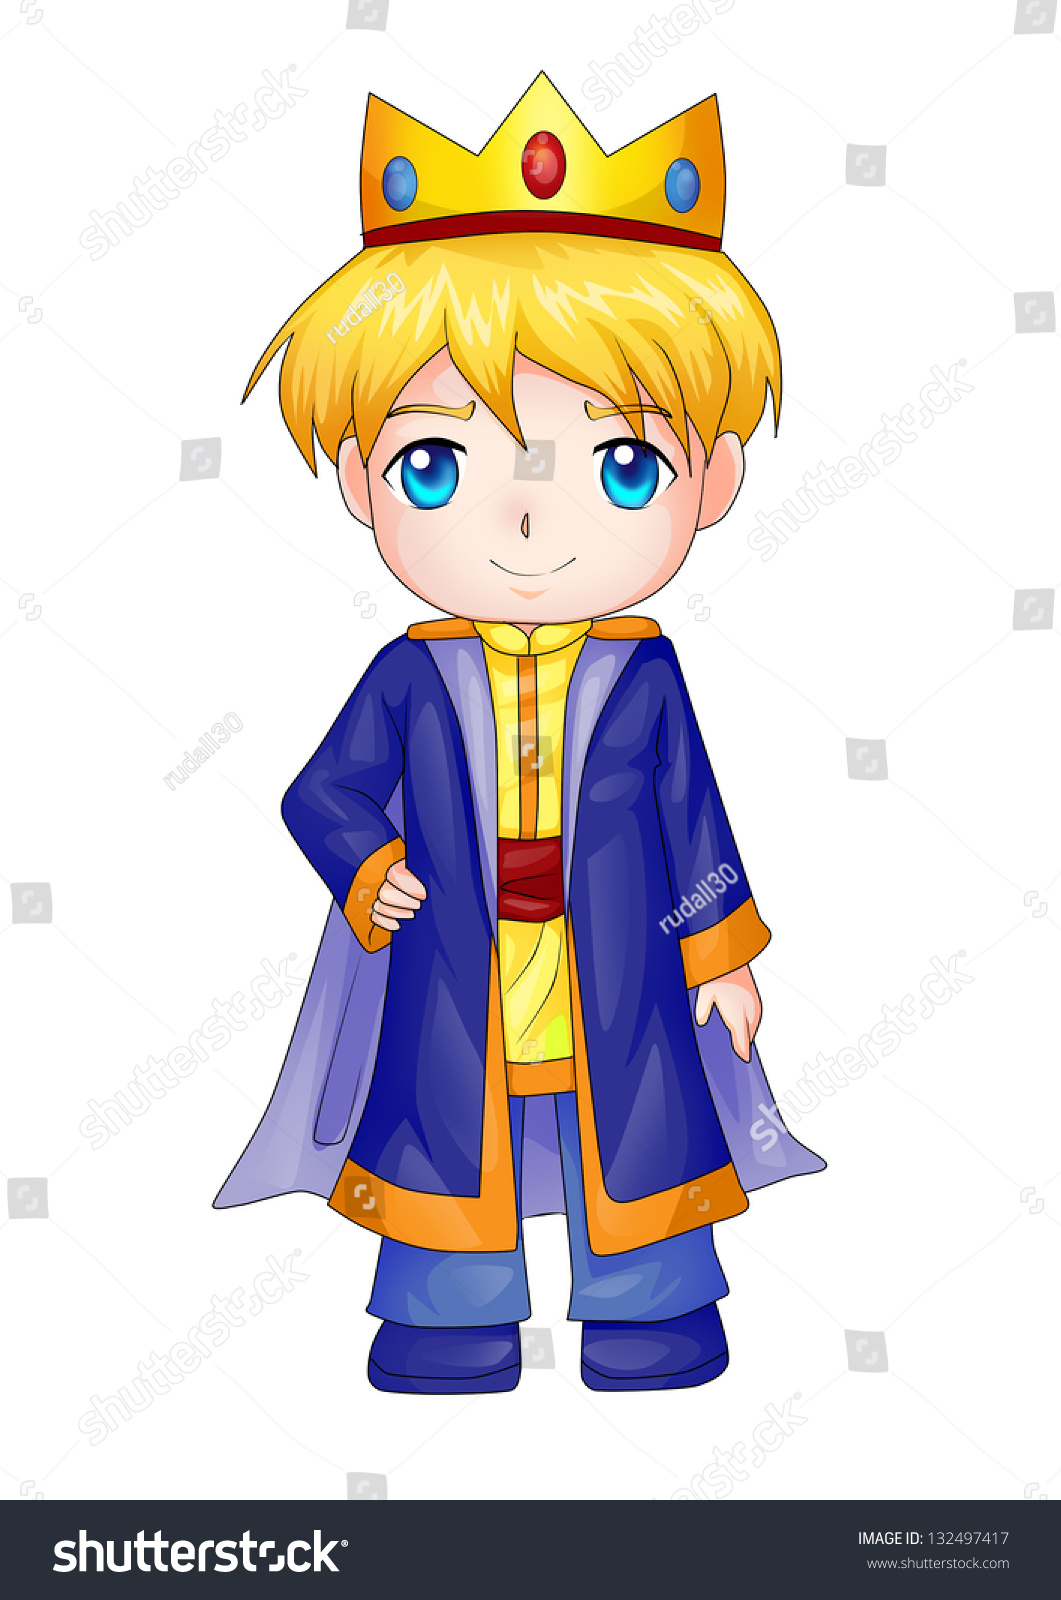 Stock Photo Cute Cartoon Illustration Of A King